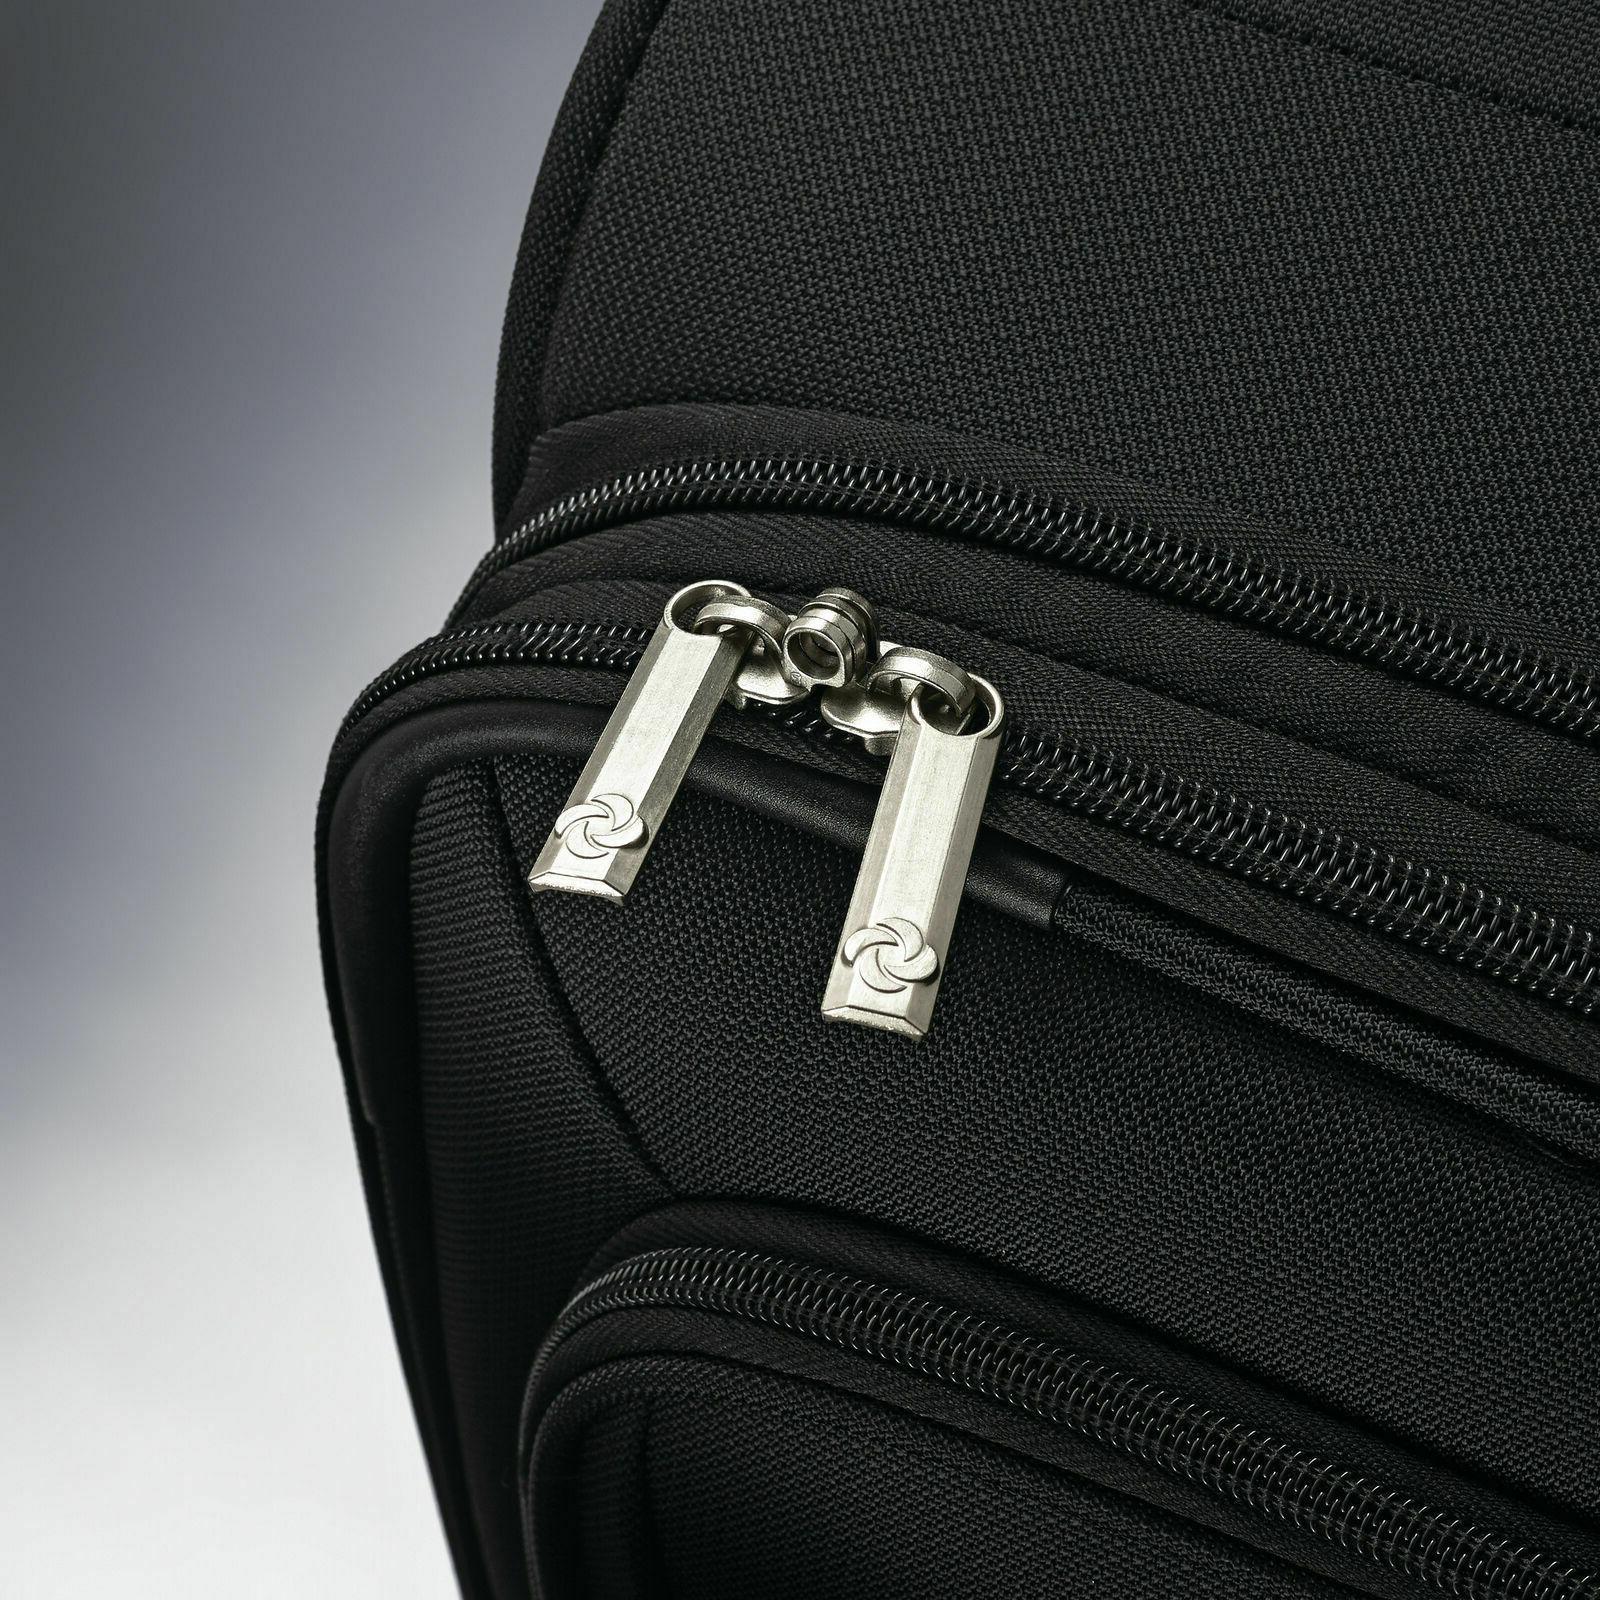 Samsonite Luggage Expandable Black